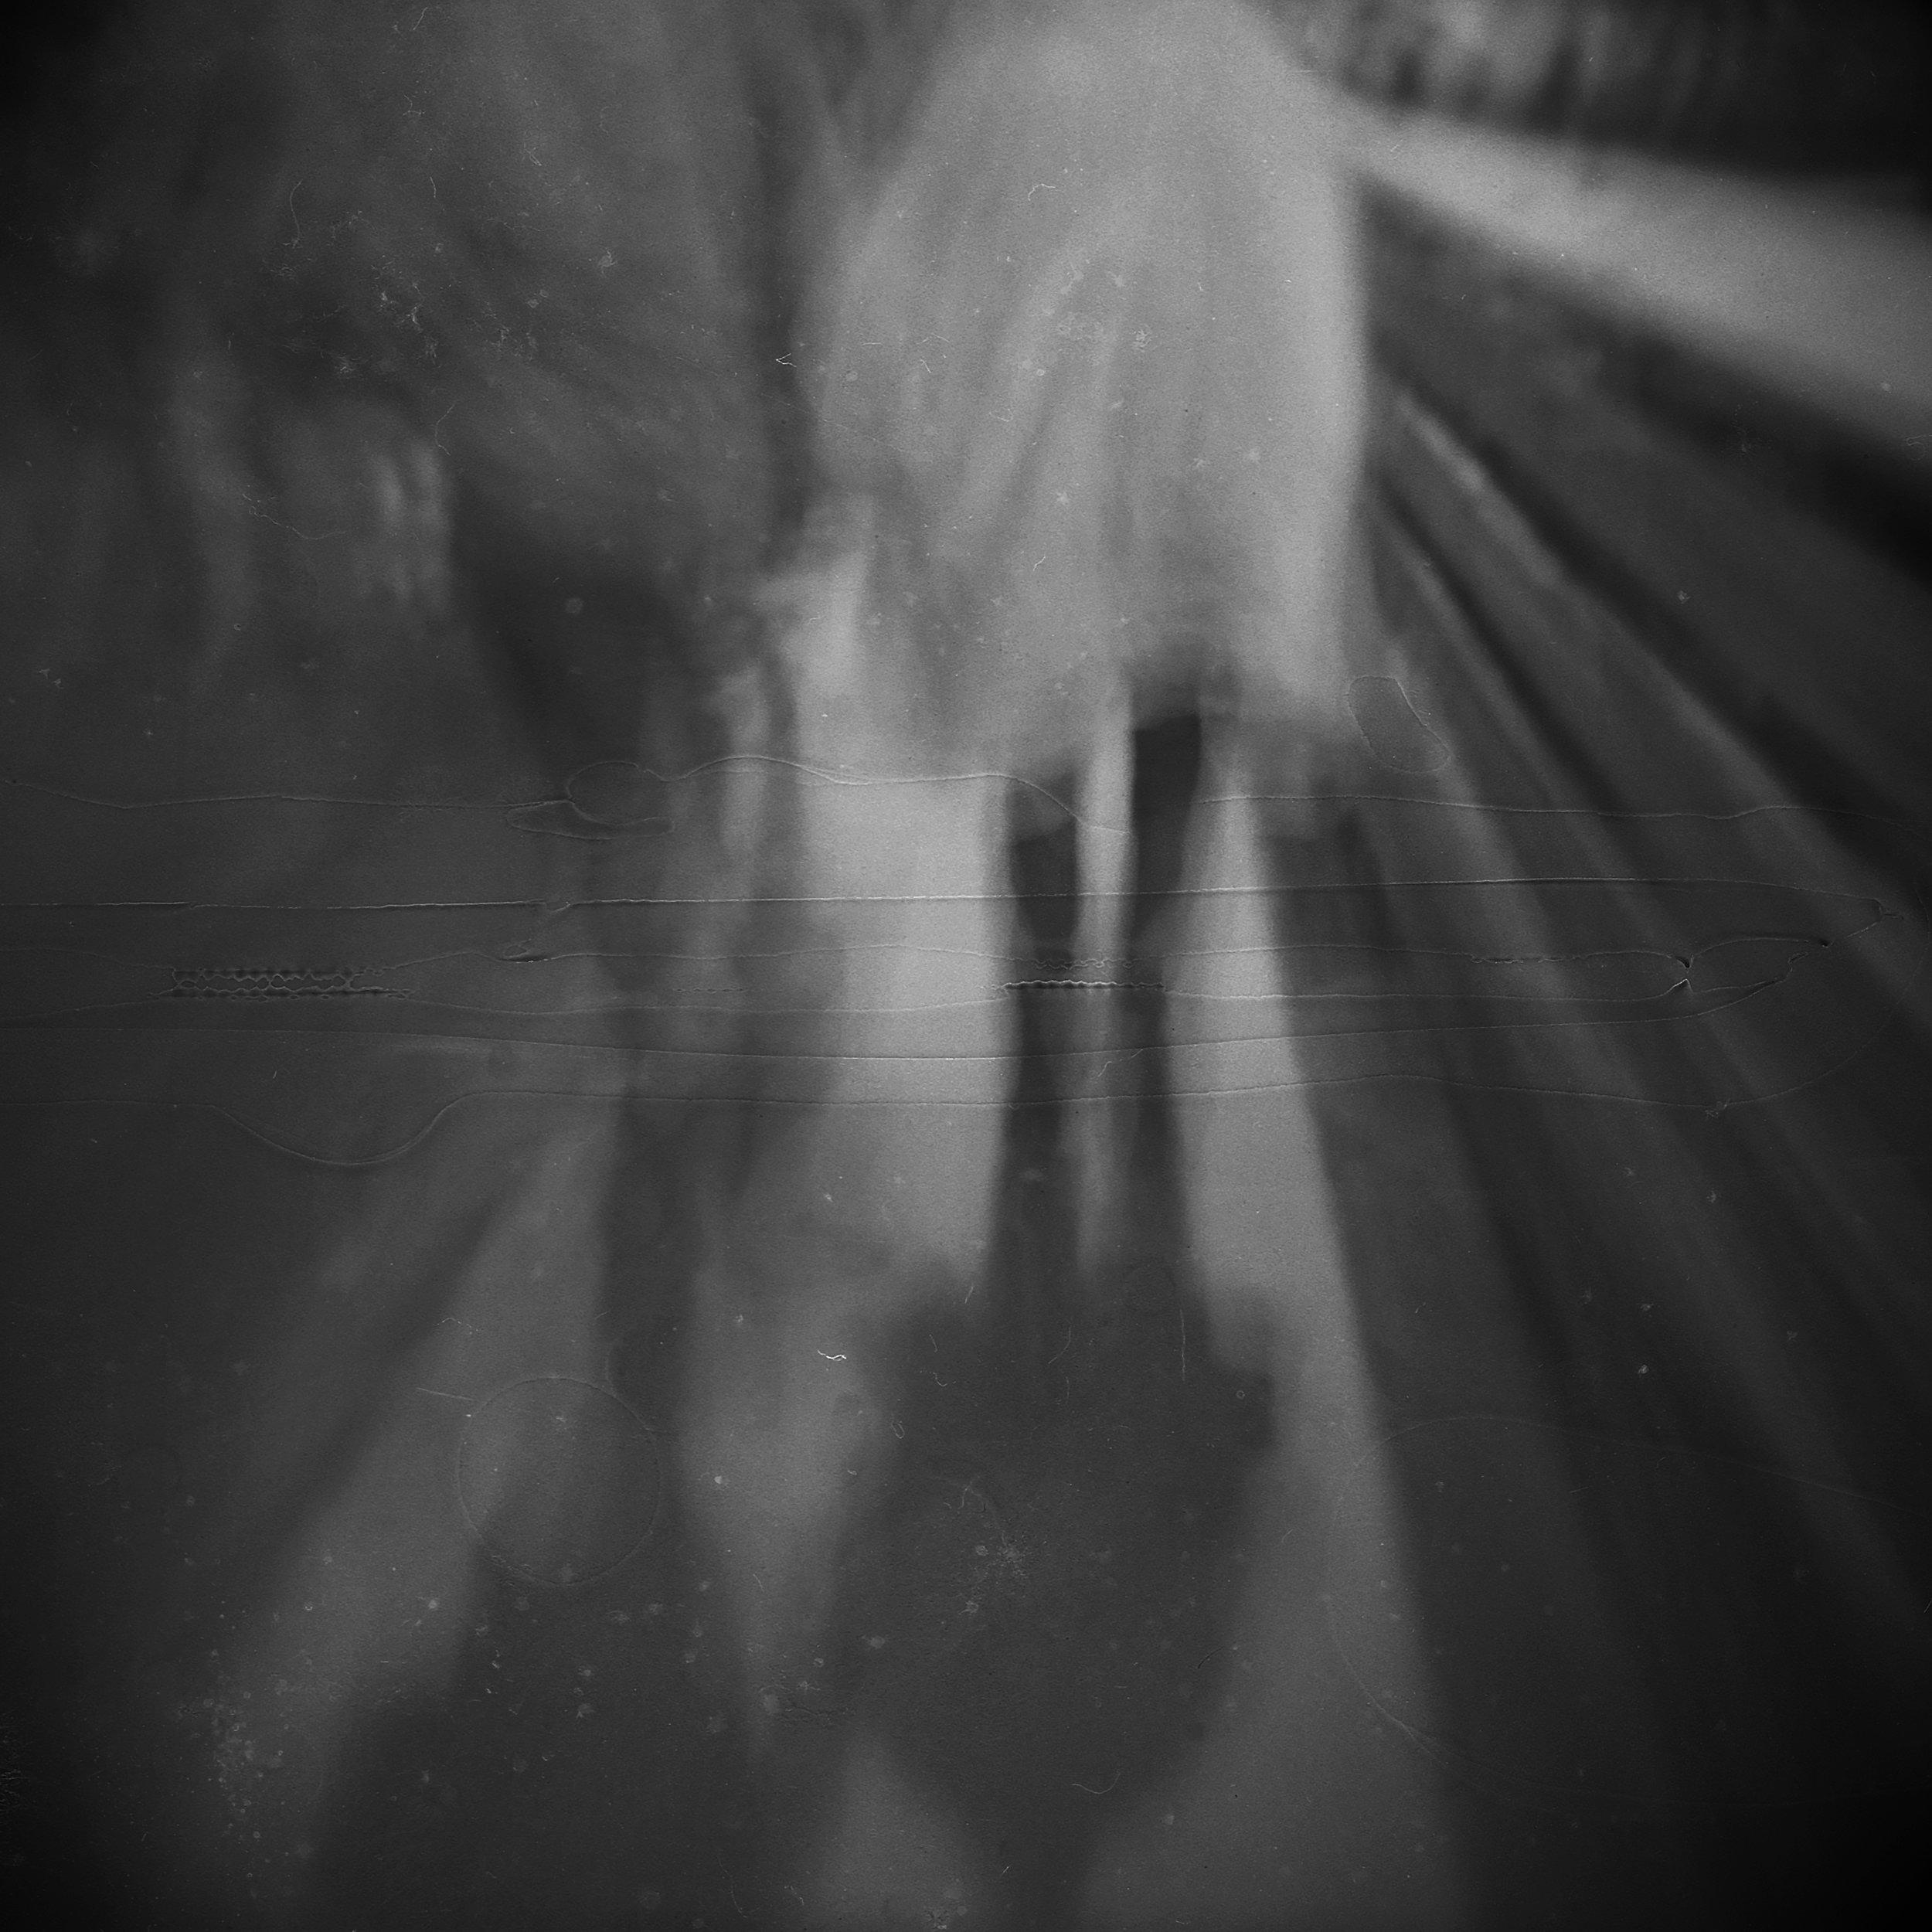 sleepwalk_5.jpg